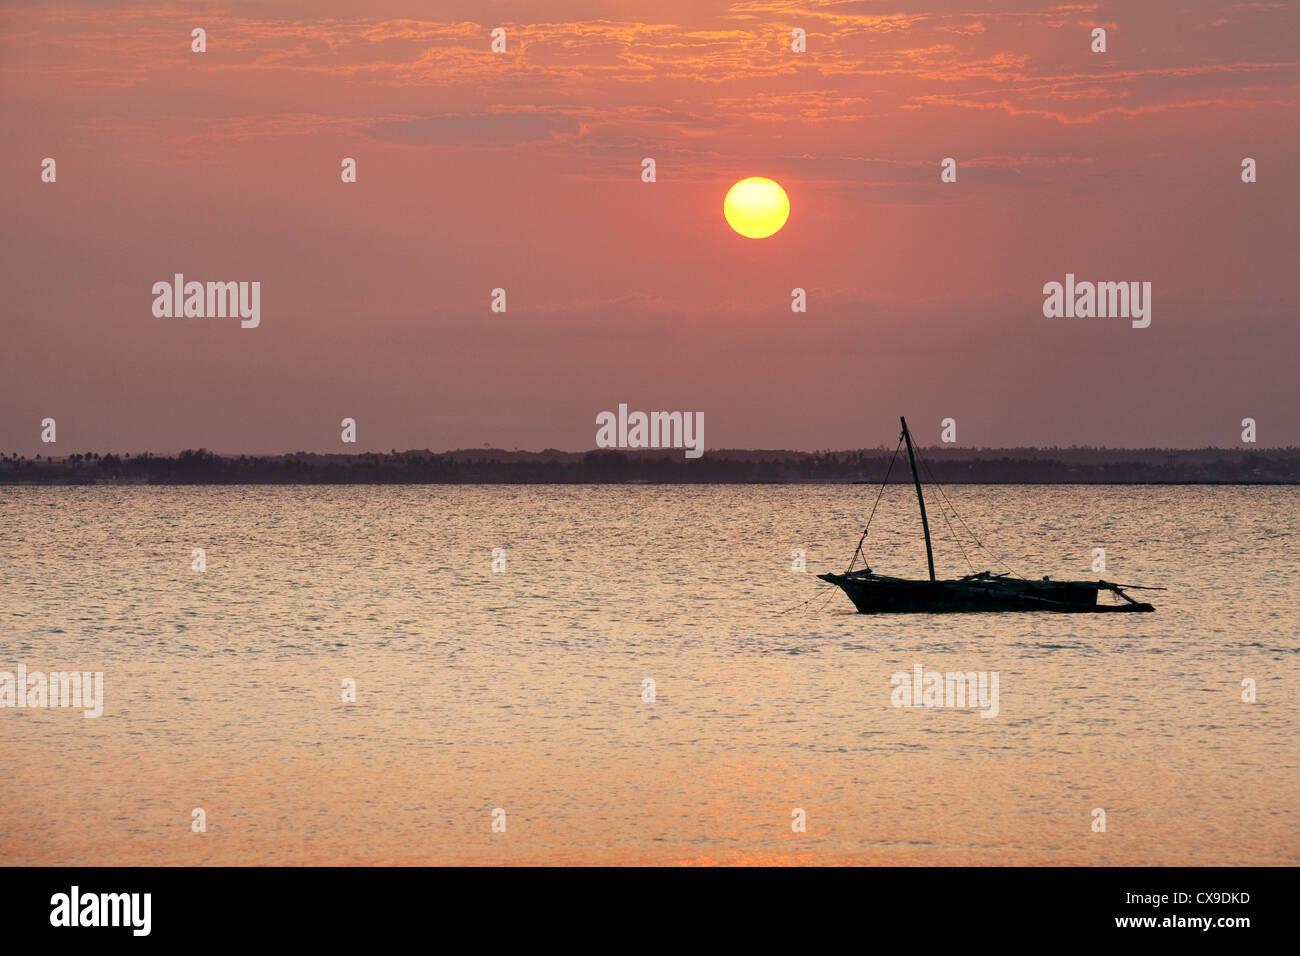 Dhow moored at sunset, Michamwi, Zanzibar Africa - Stock Image